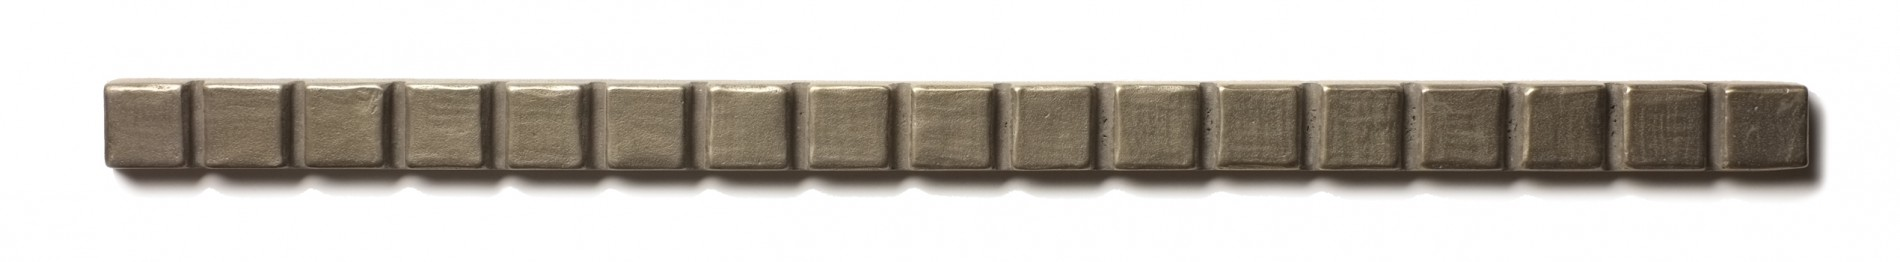 "Mosaic Liner 0.63x12"" accent liner  White Bronze"